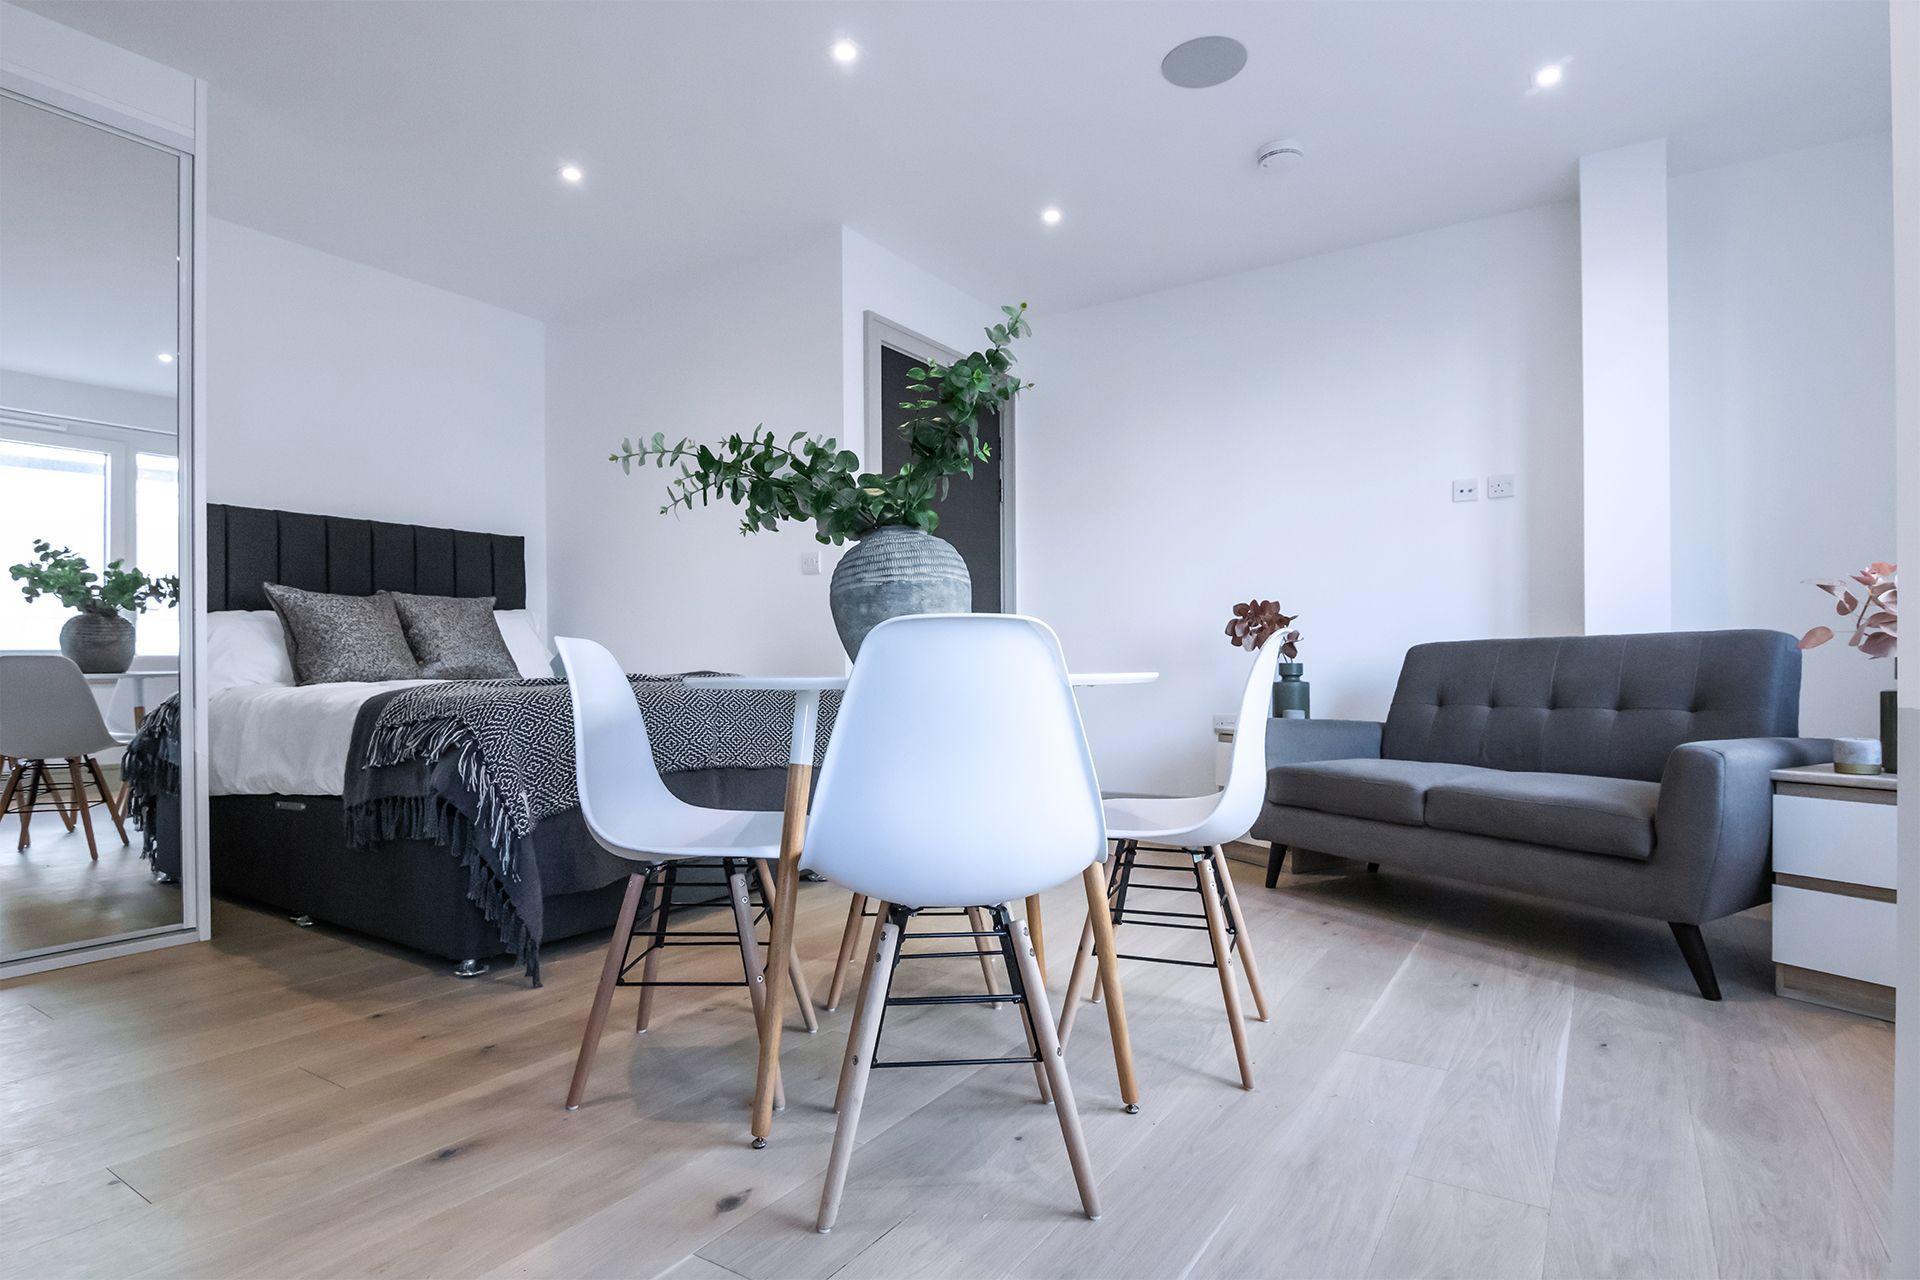 Studio apartment to rent in London FIN-FL-0004